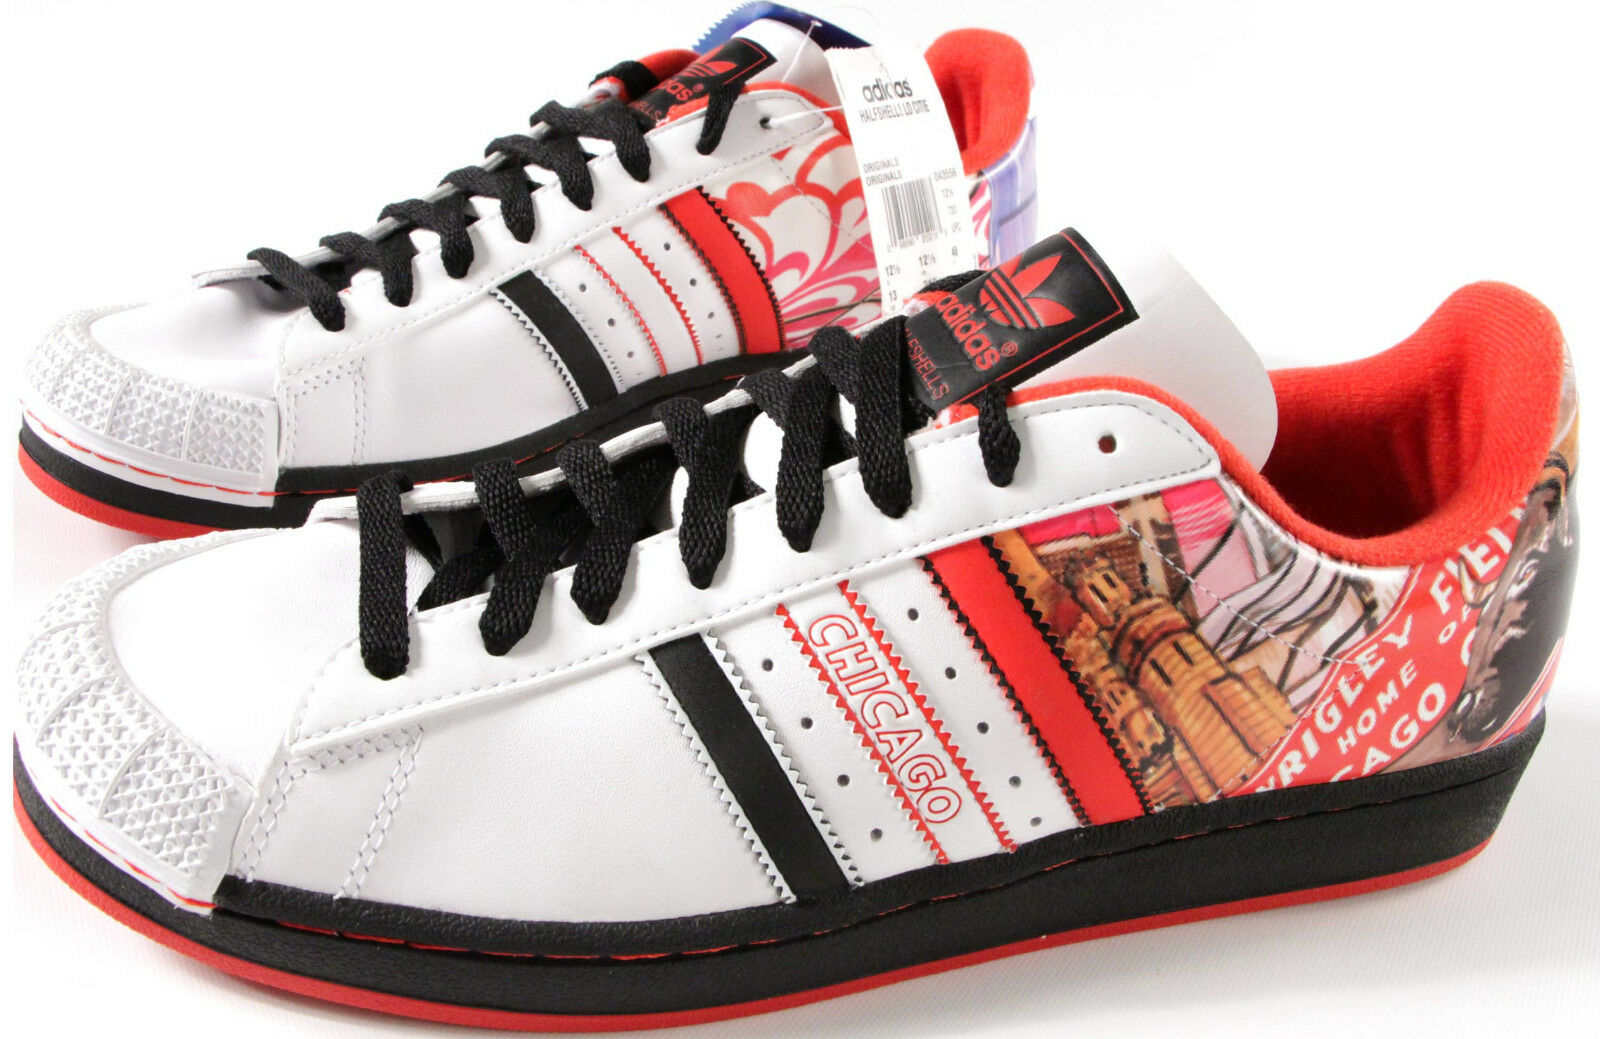 ADIDAS Originals HalfShell Sneakers- 13-NEW-Chicago Bull Wrigley Field Shoe-179